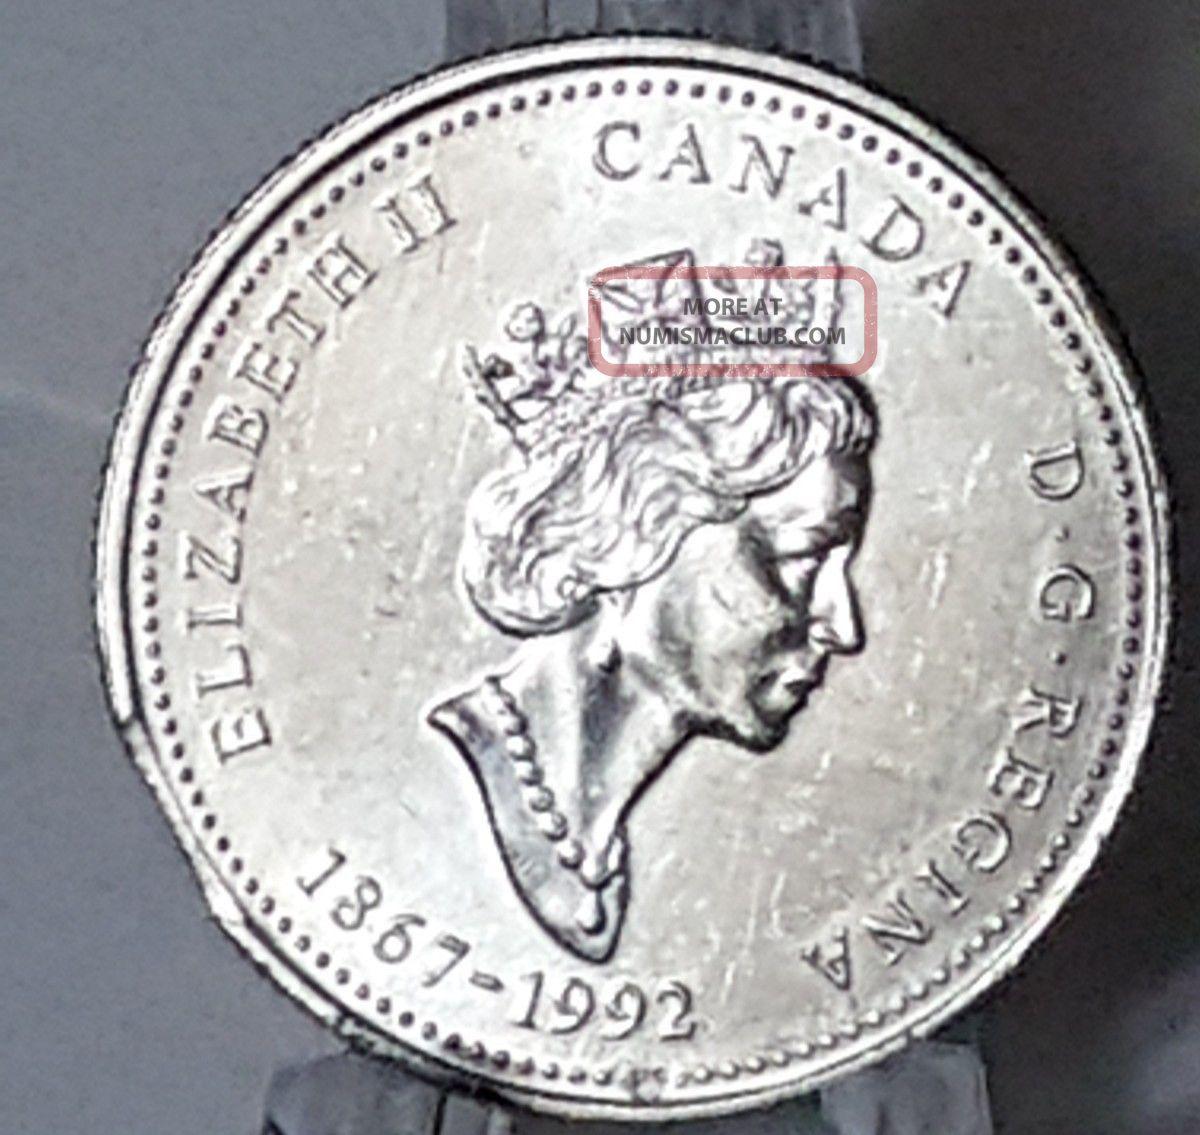 1992 Canada Twenty Five Cent Error Coin Clipped Planchet - Pei 25c Coins: Canada photo